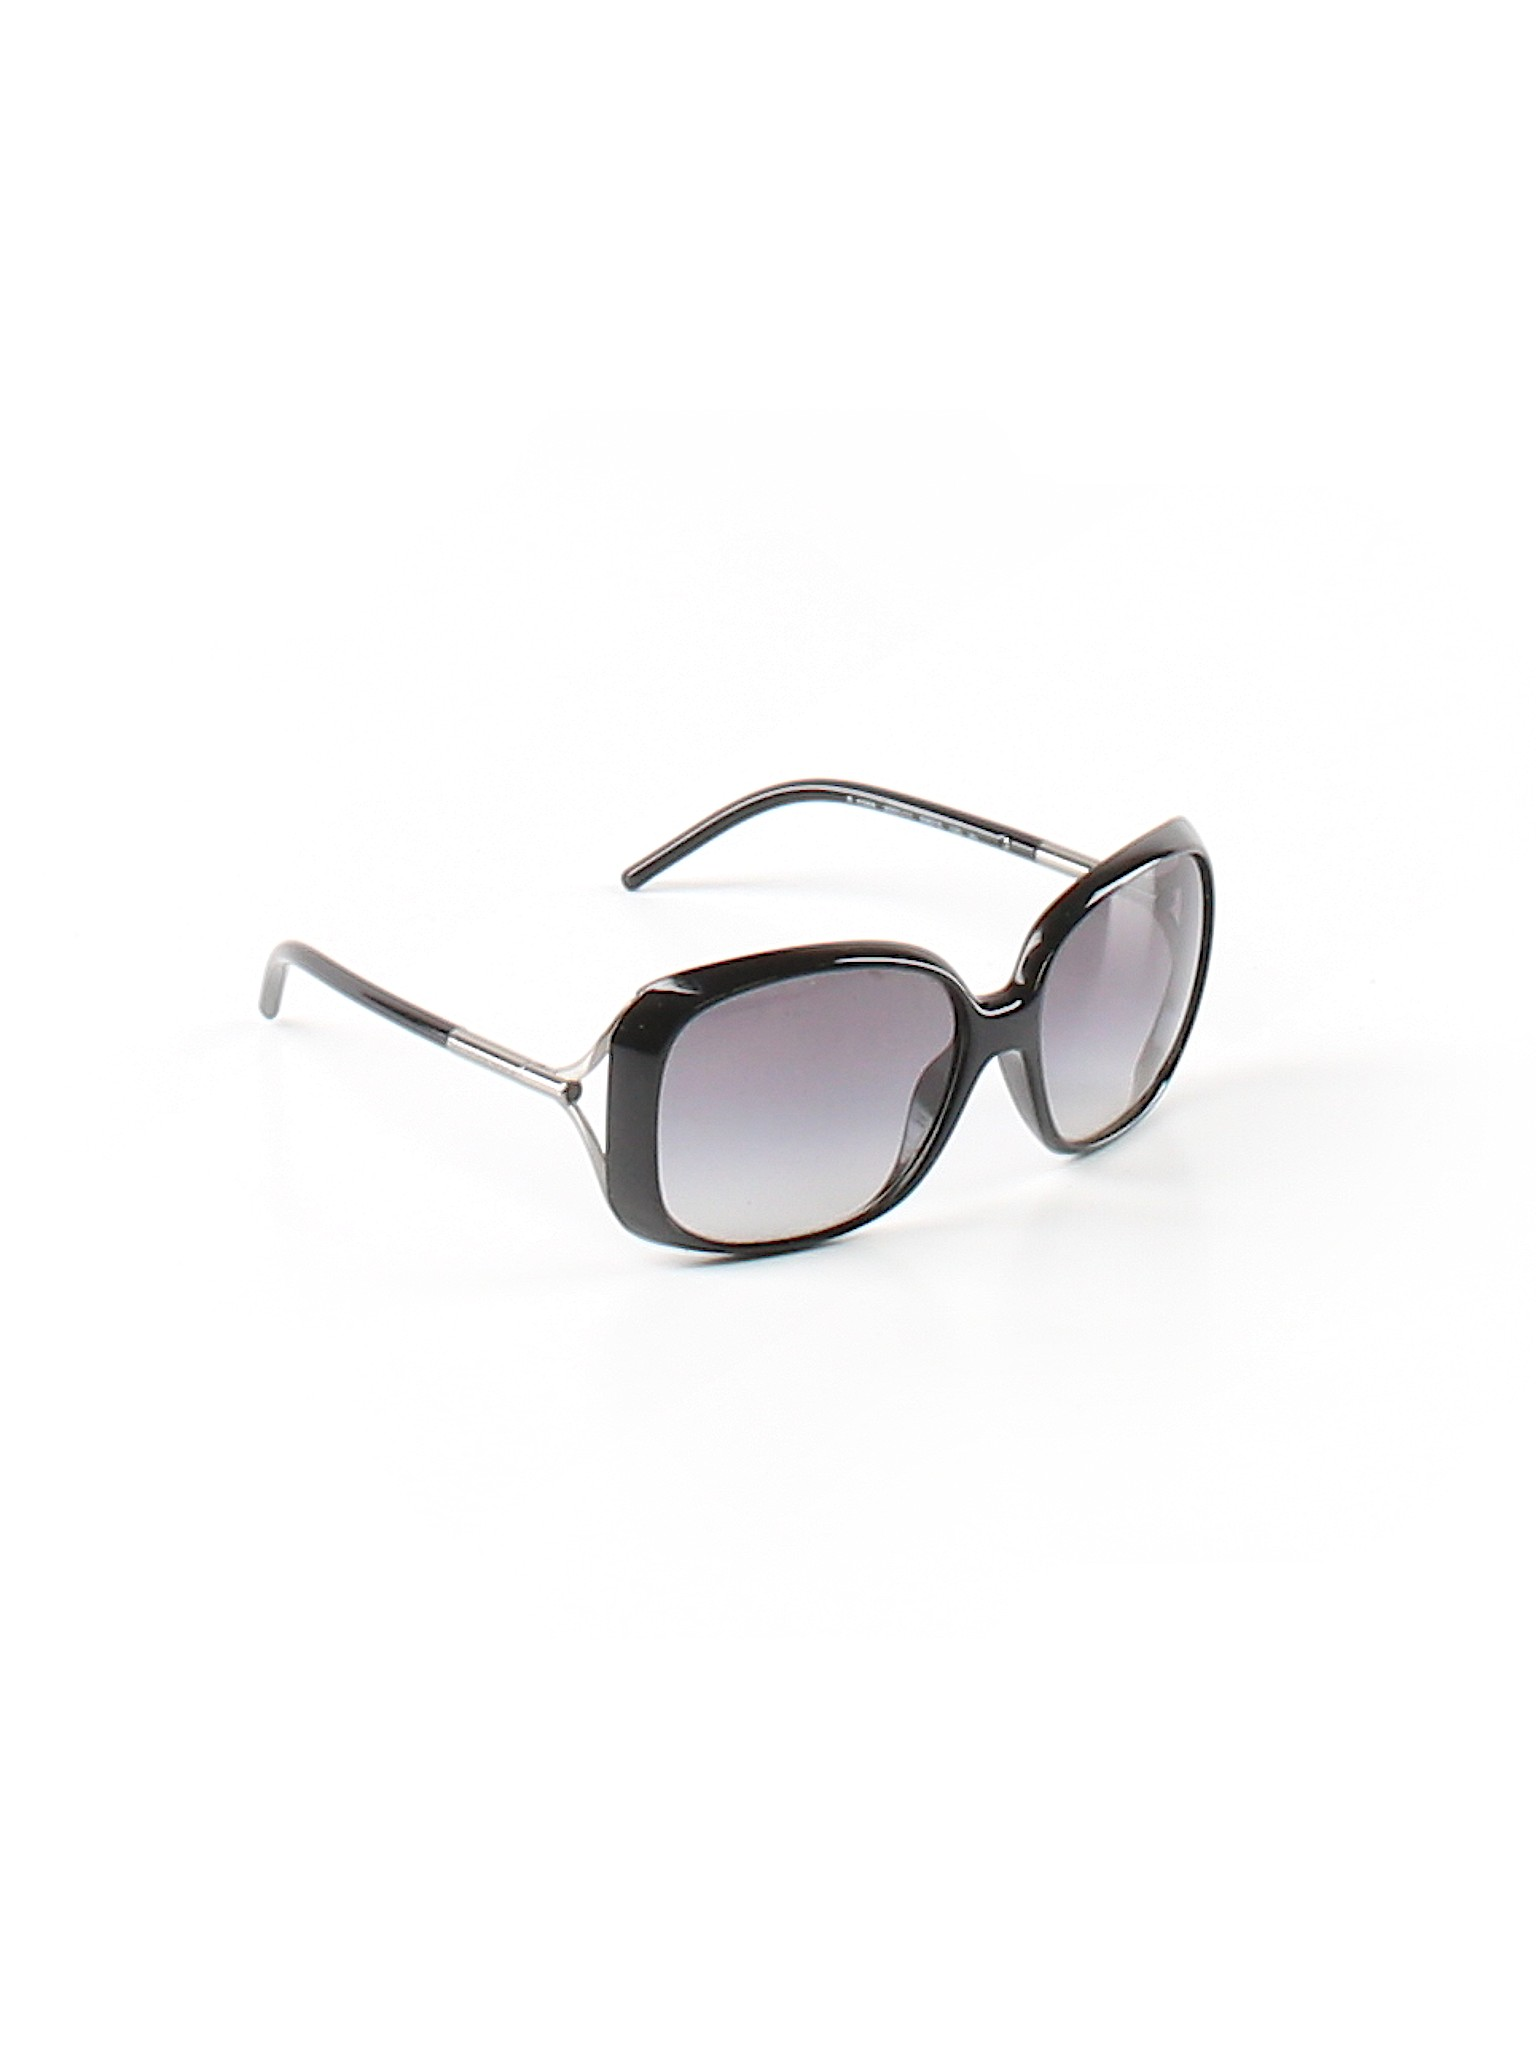 60849e054 Sunglasses | Products | Burberry sunglasses, Sunglasses, Burberry